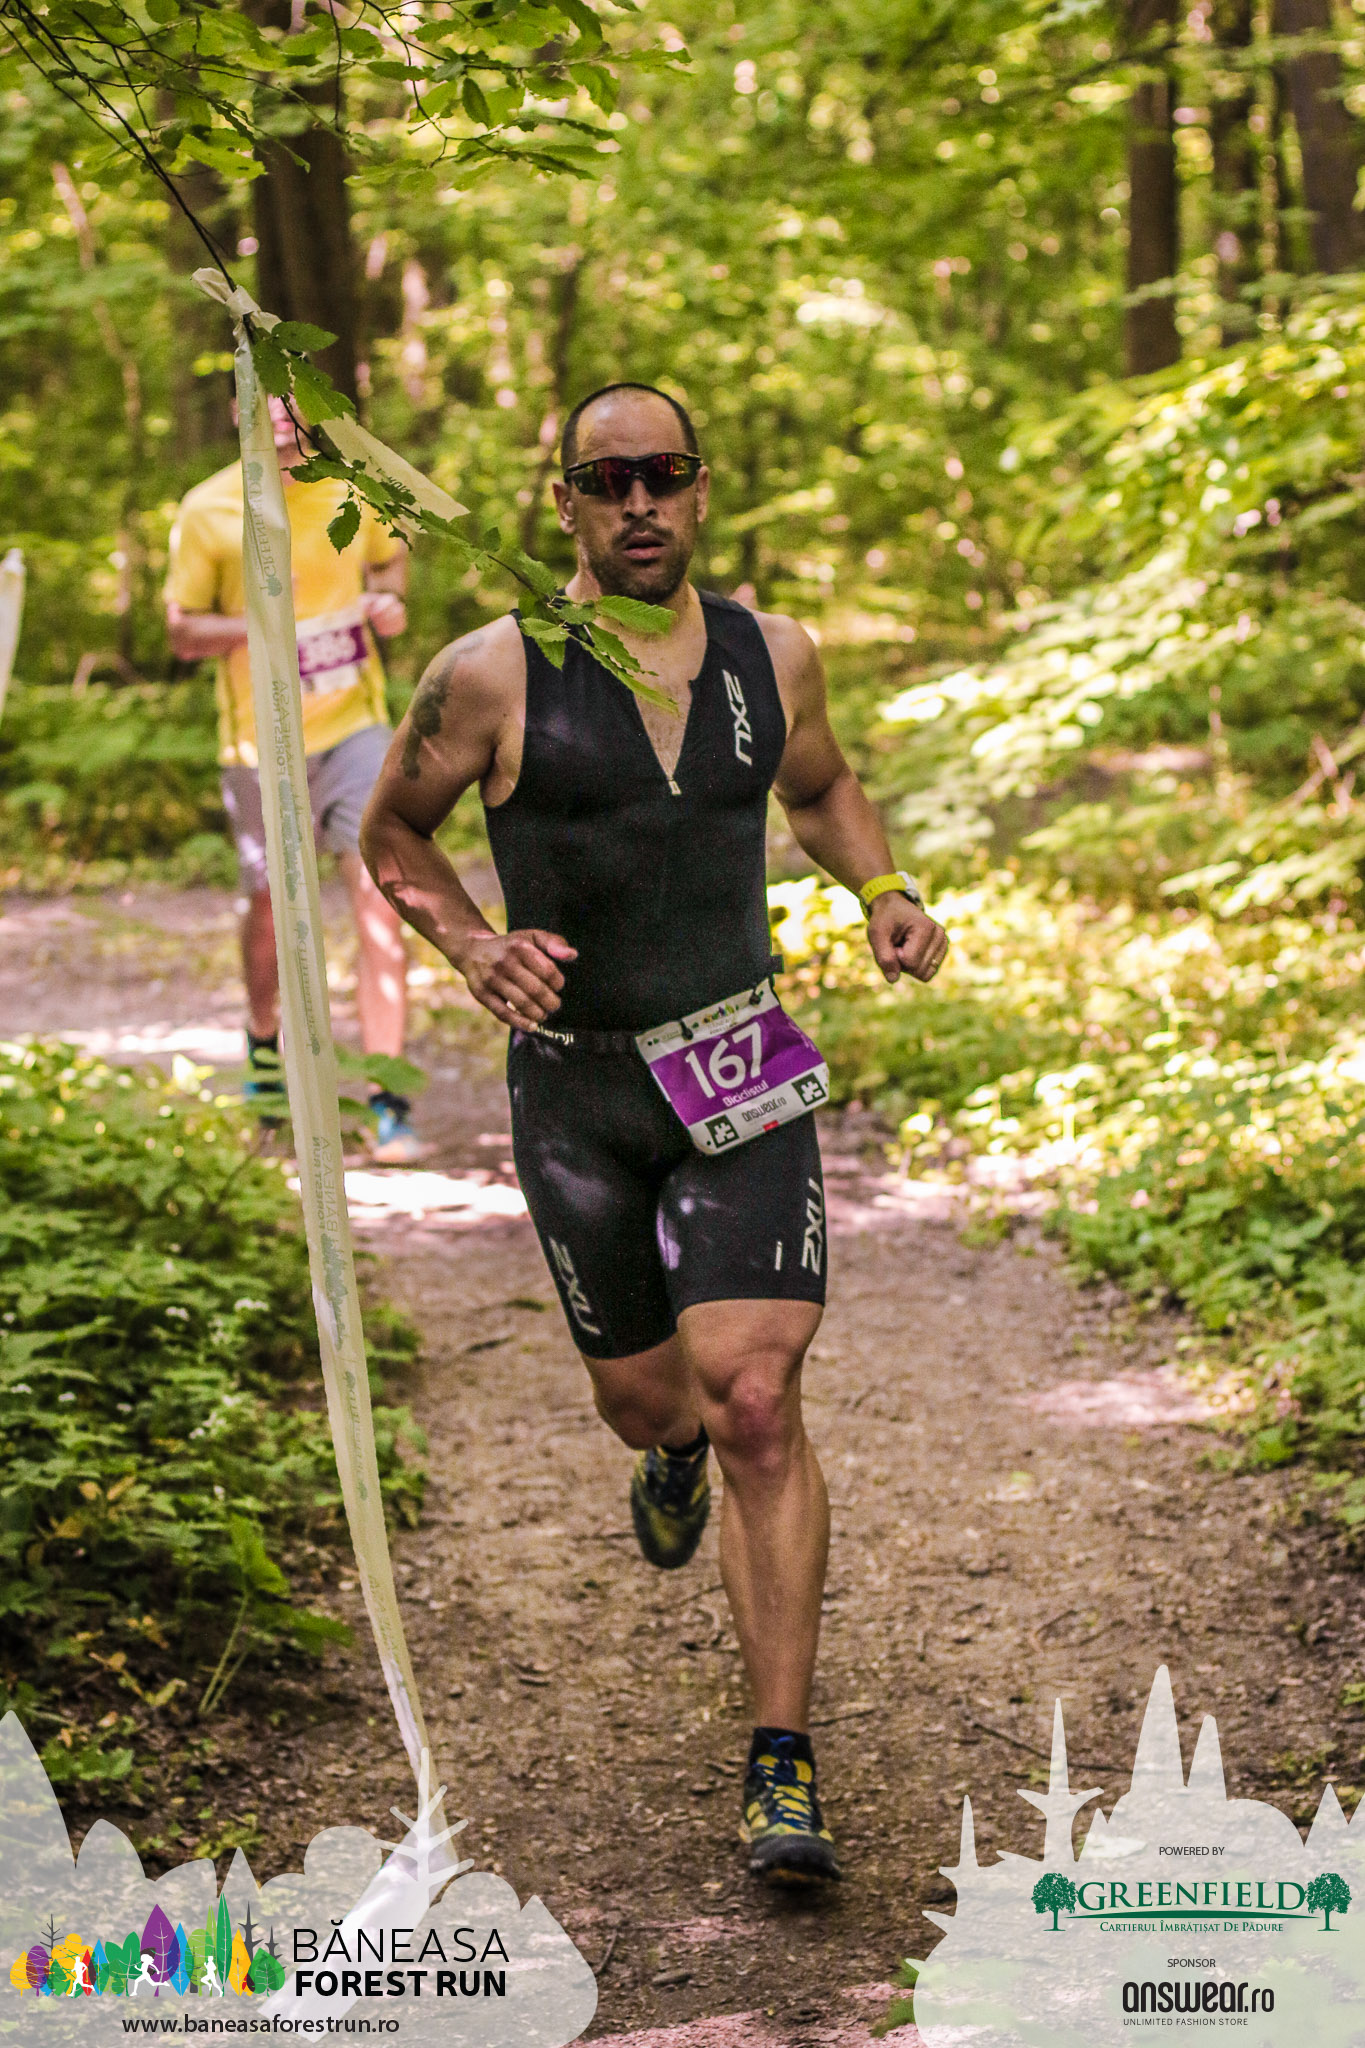 Baneasa Forest Run 2018 - Emilian Nedelcu